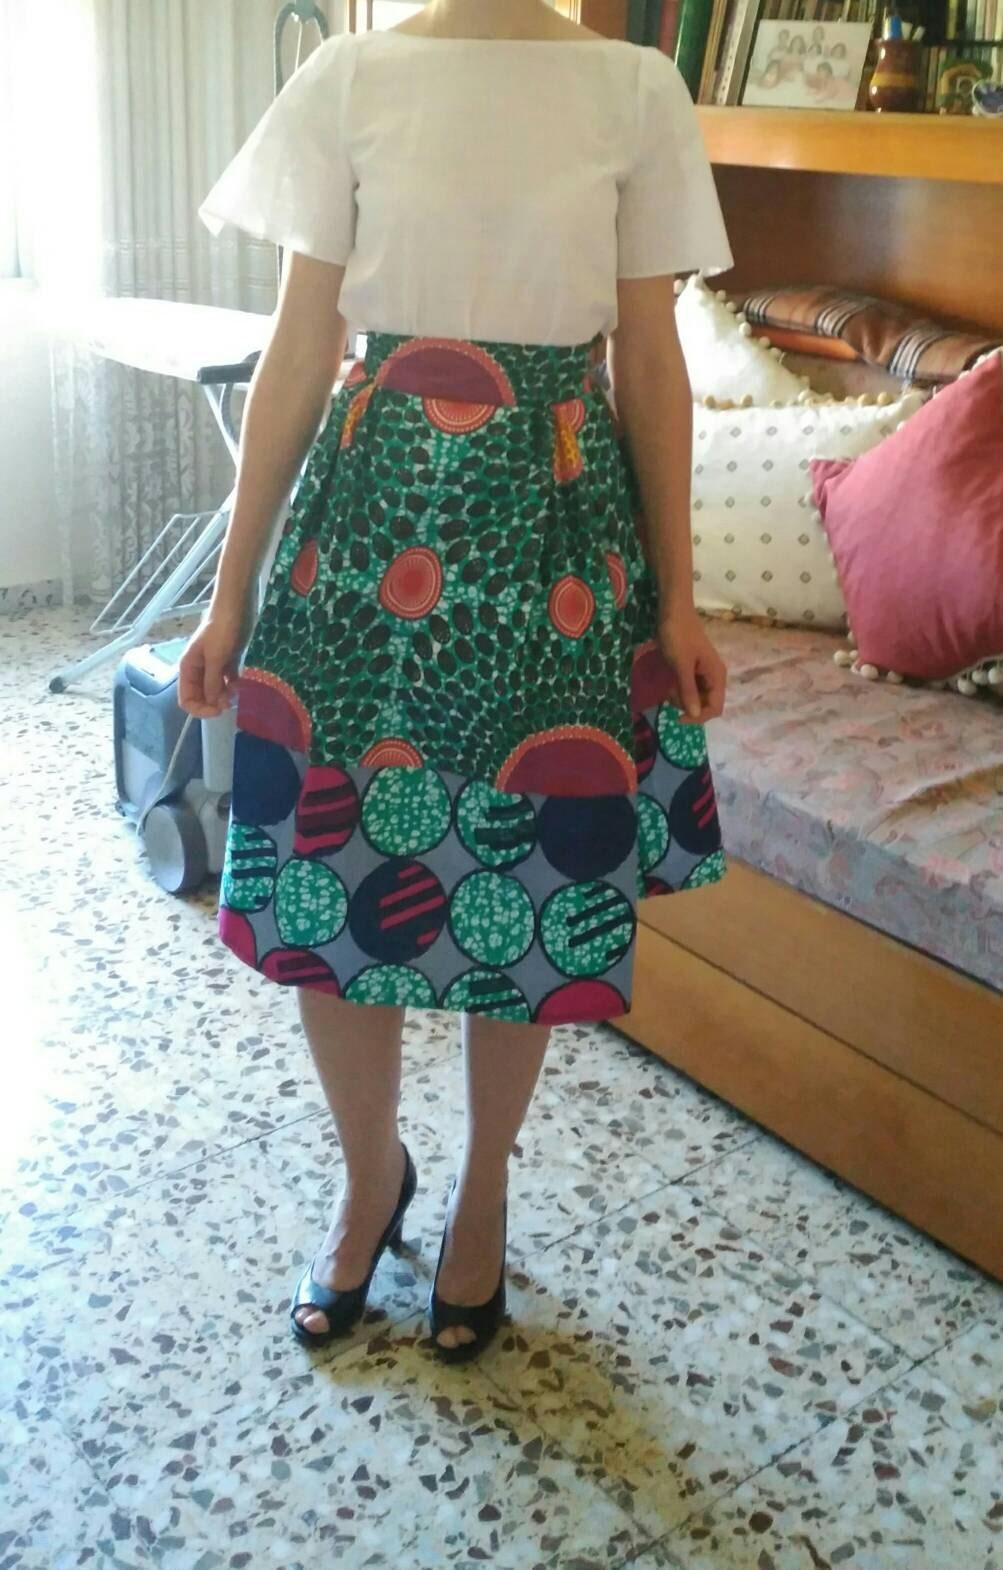 Silvia Hidalgo Martínez added a photo of their purchase